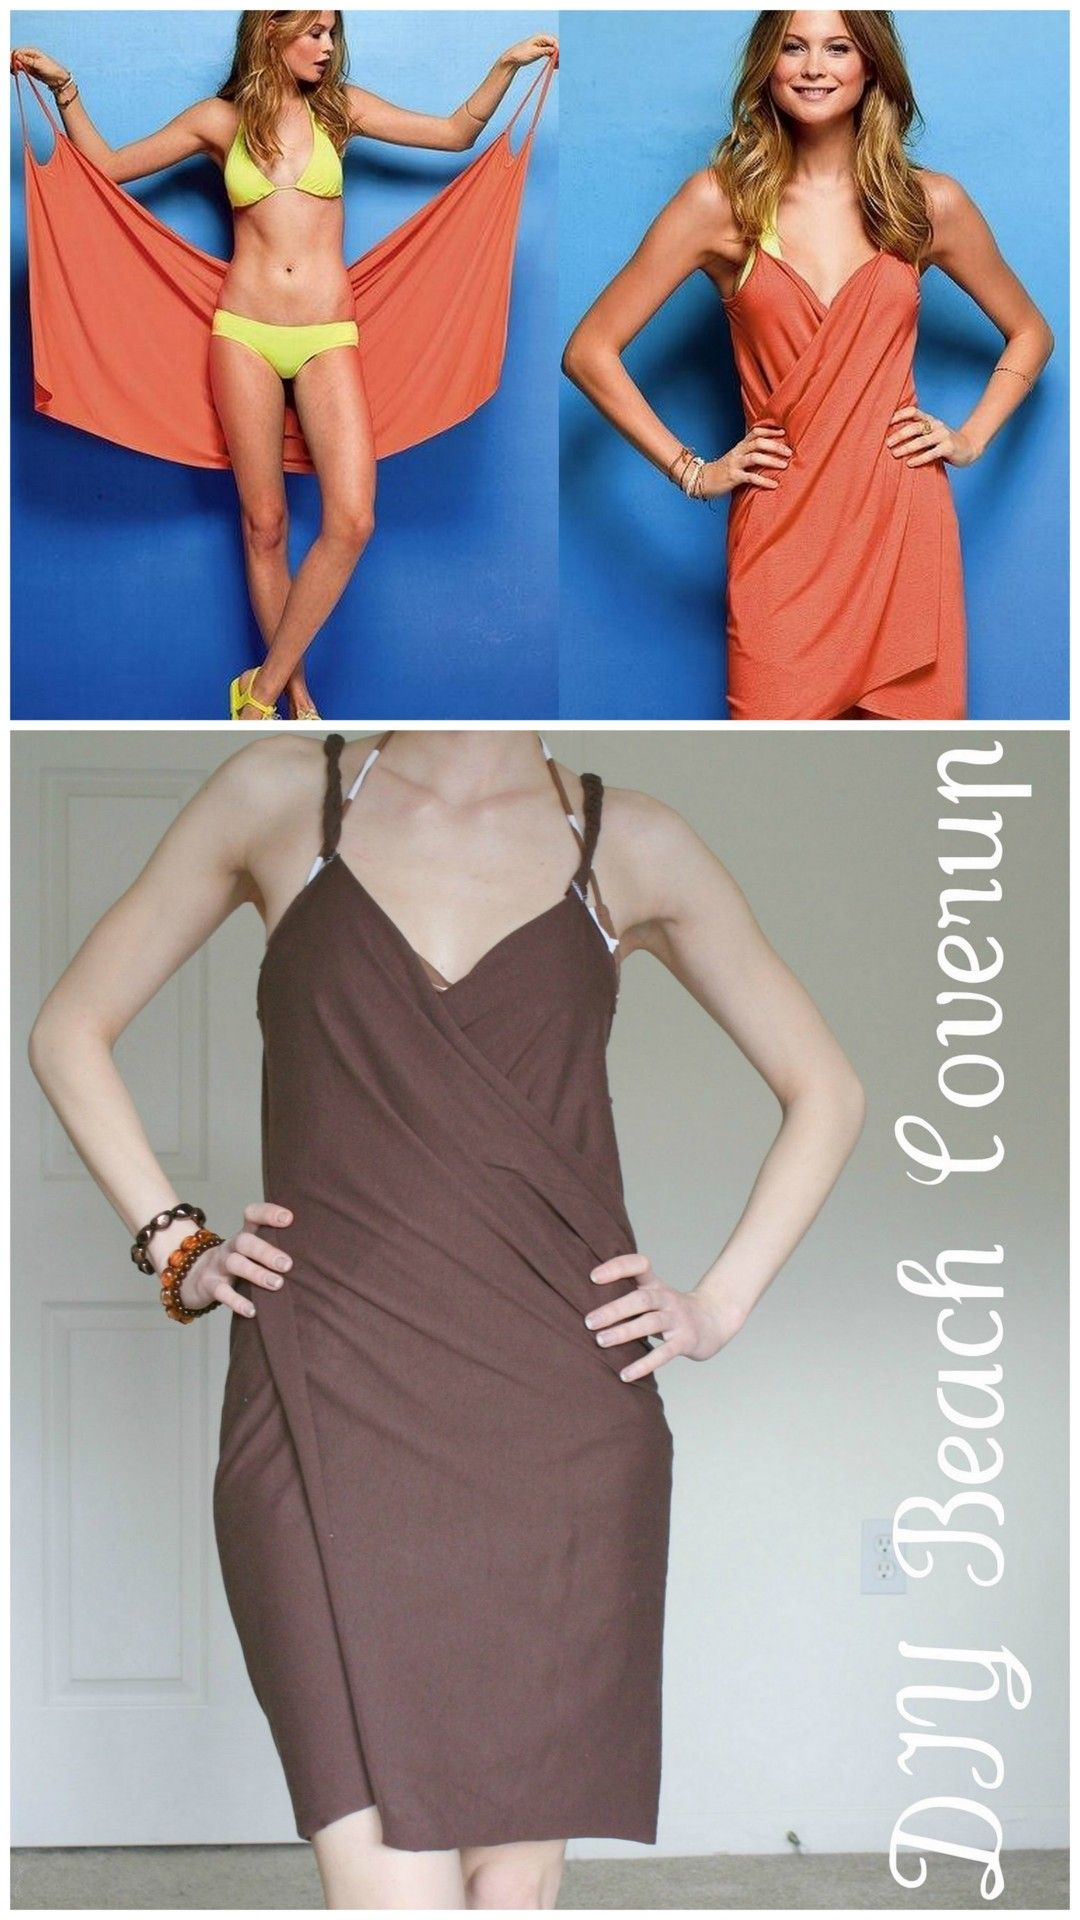 b0e9f5ebb564f DIY Easy Victorias Secret Beach Cover Up. Remember when I posted this  Victorias Secret Cover